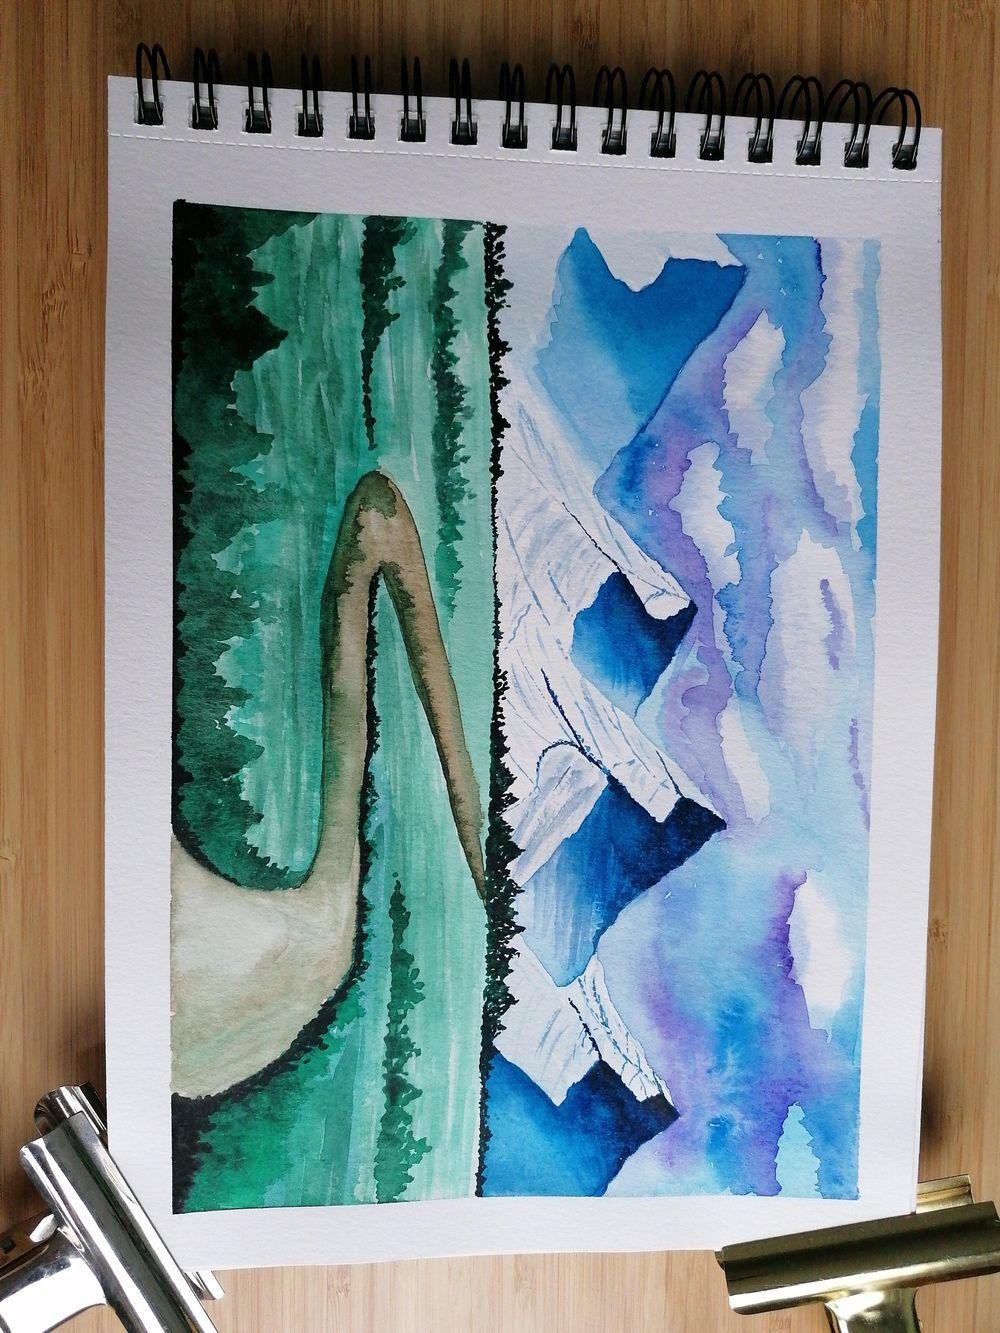 Watercolor landscape - image 6 - student project